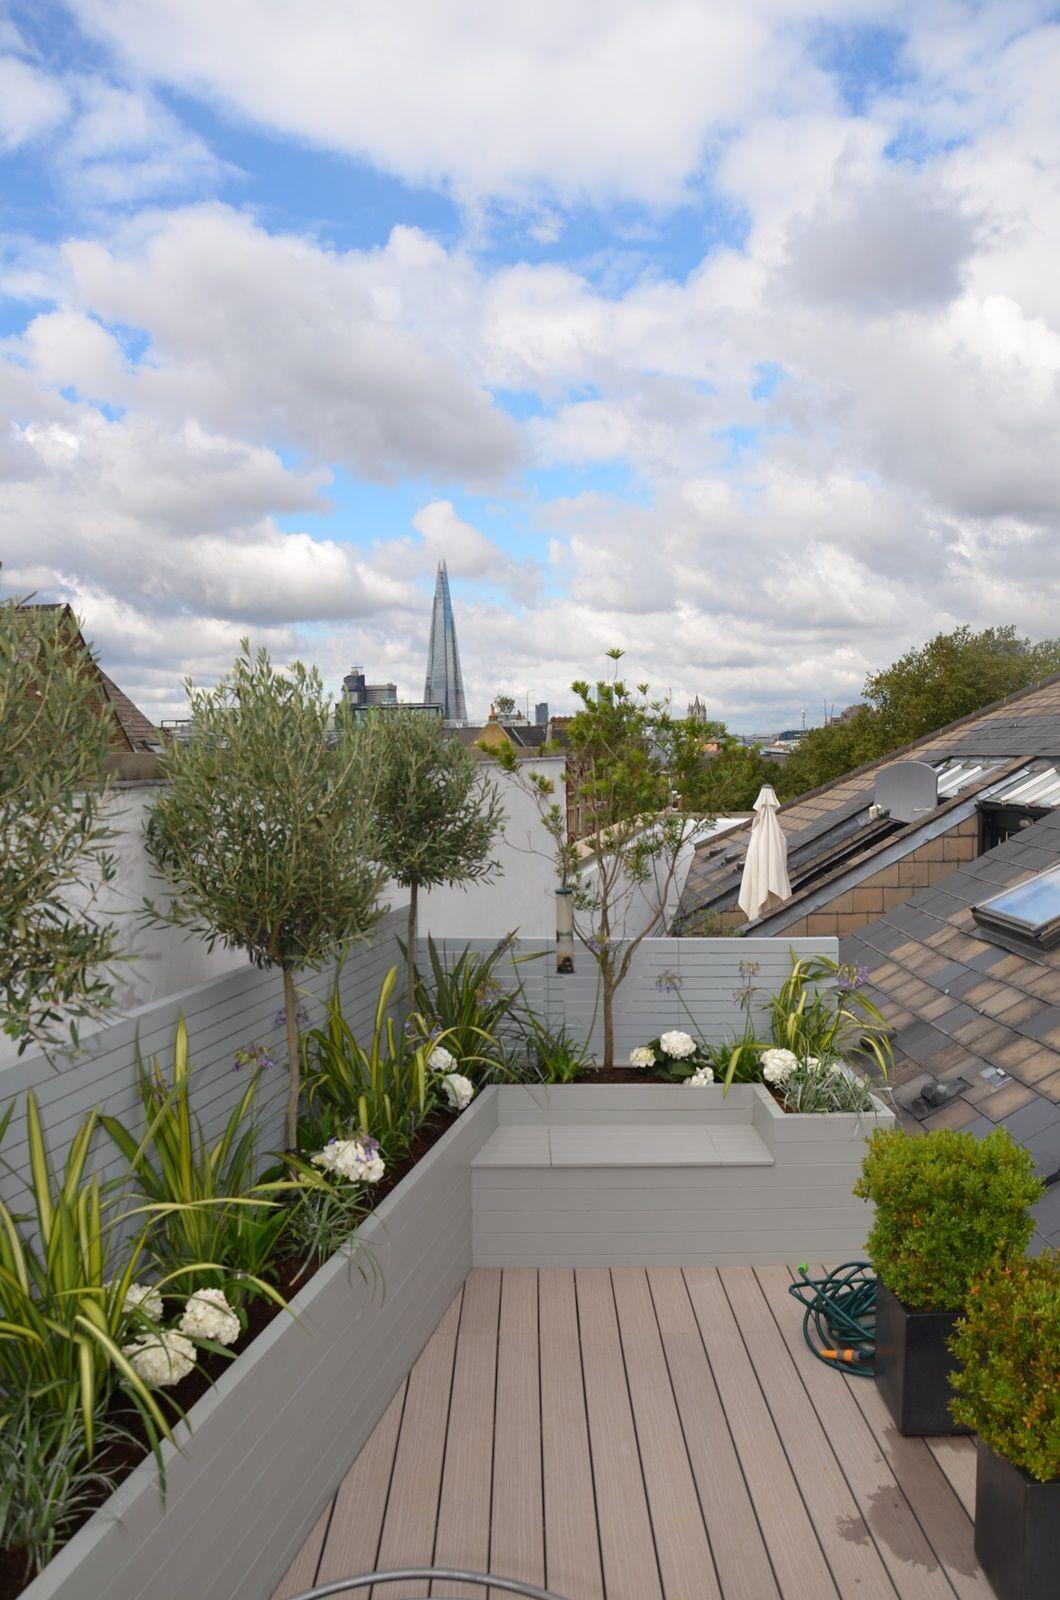 Roof Terrace And Balcony Garden Design Tower Bridge Fulham Chelsea Battersea London With Images Terrace Design Roof Terrace Terrace Garden